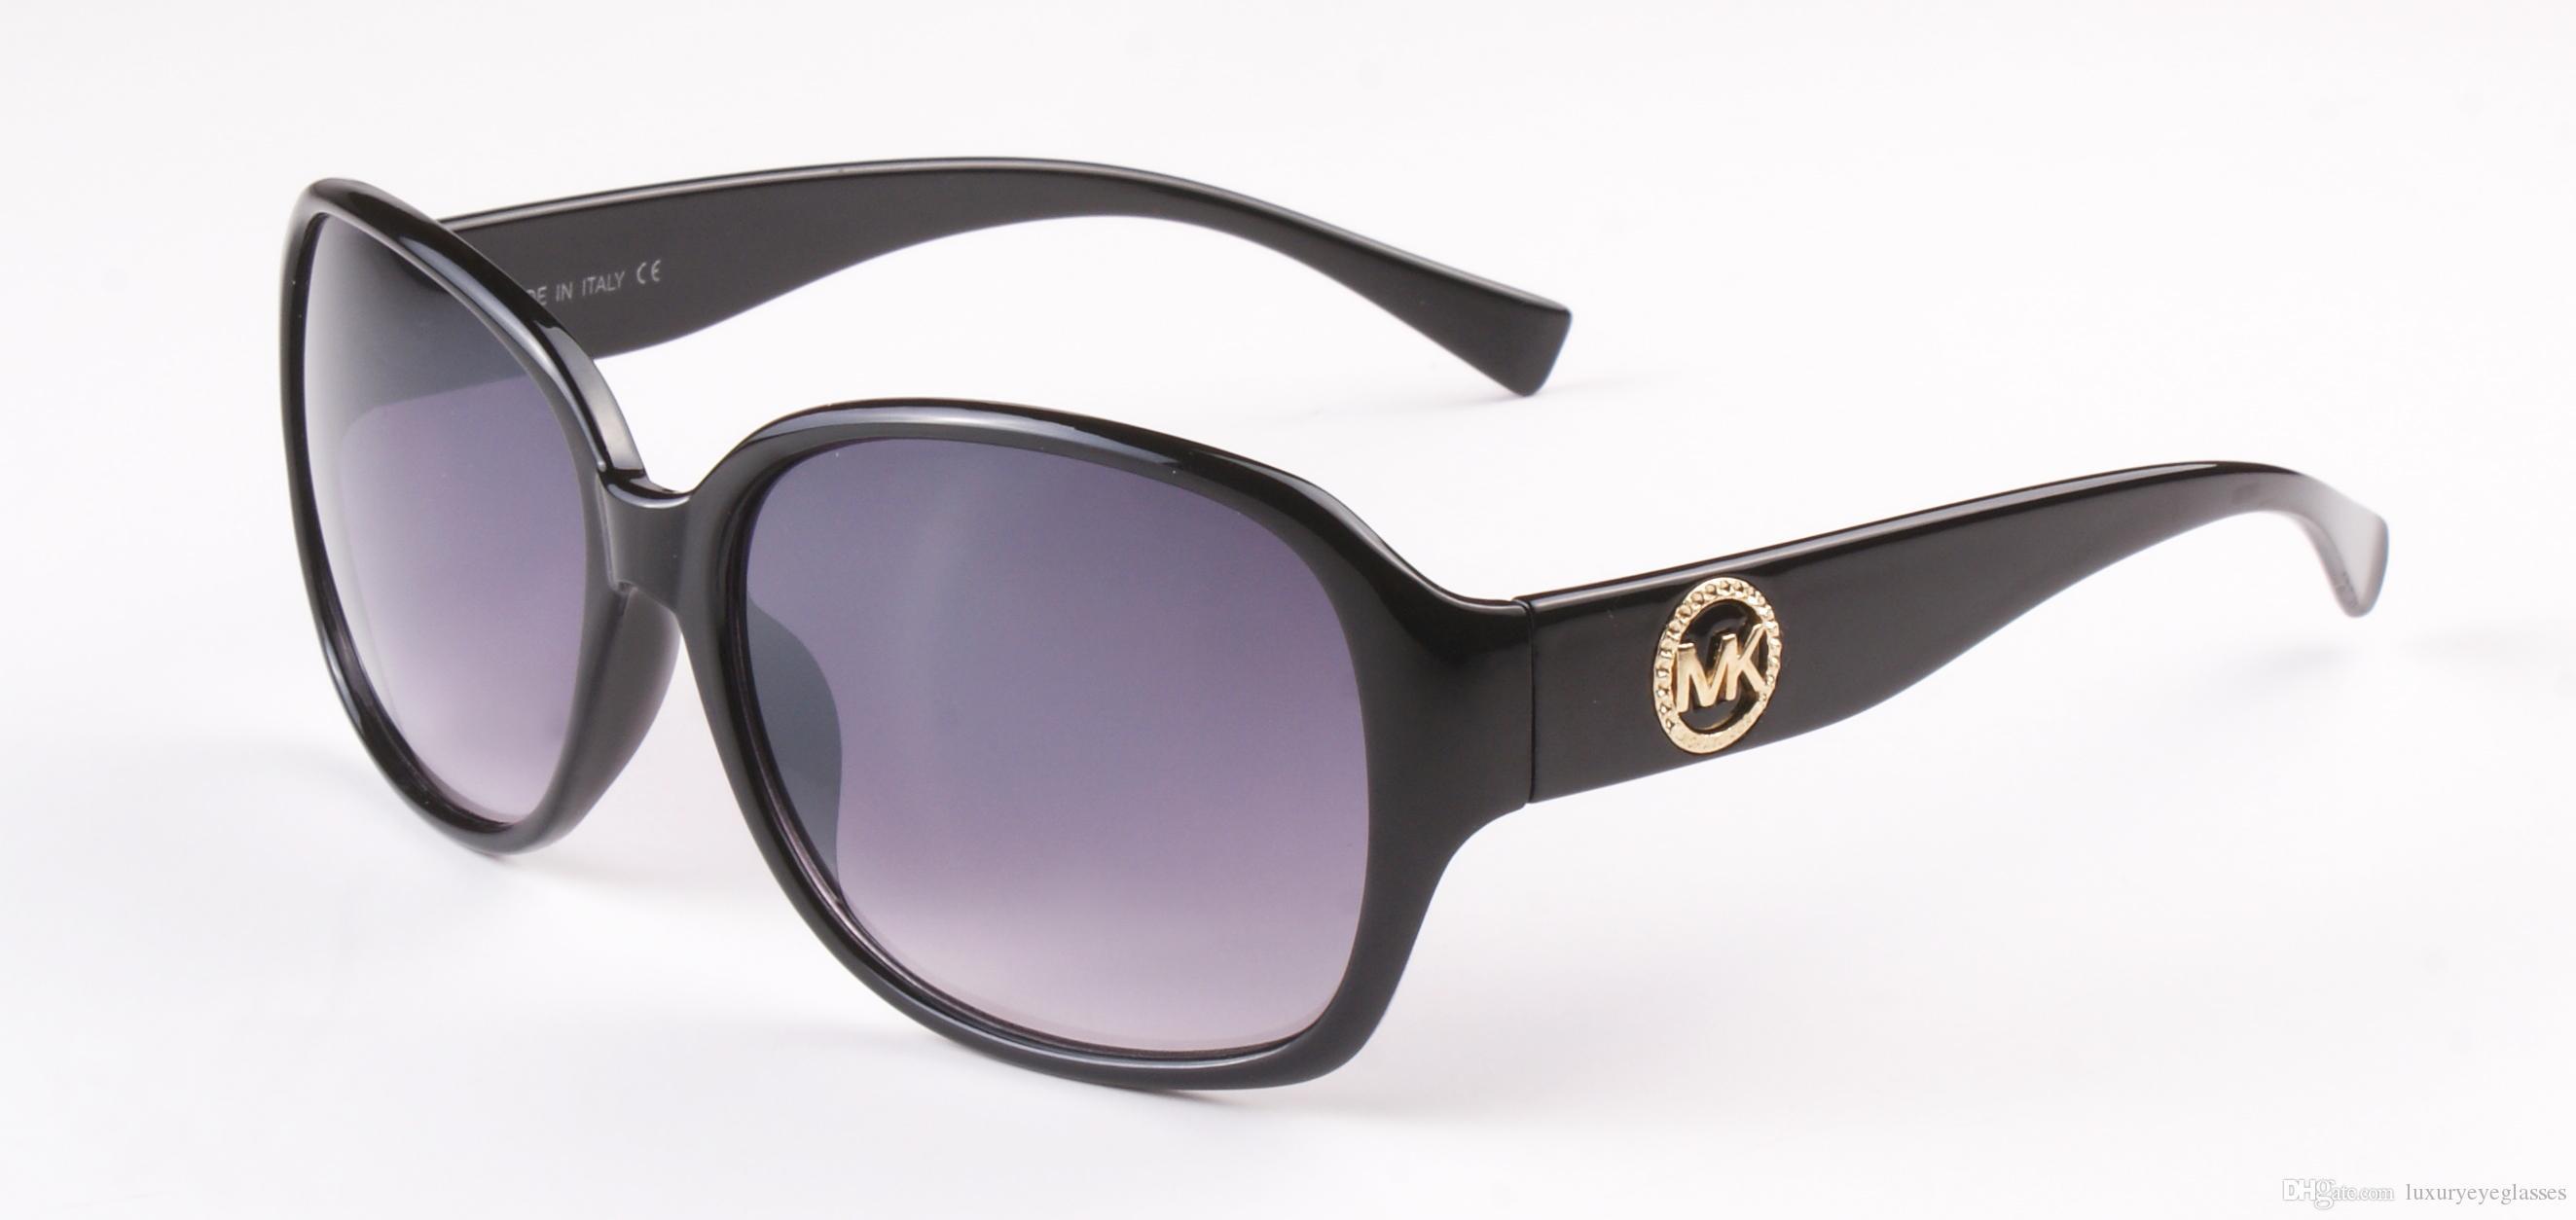 839c55ce435 Sunglasses Womens Brand Designer High Version Oval Frame Polarized ...